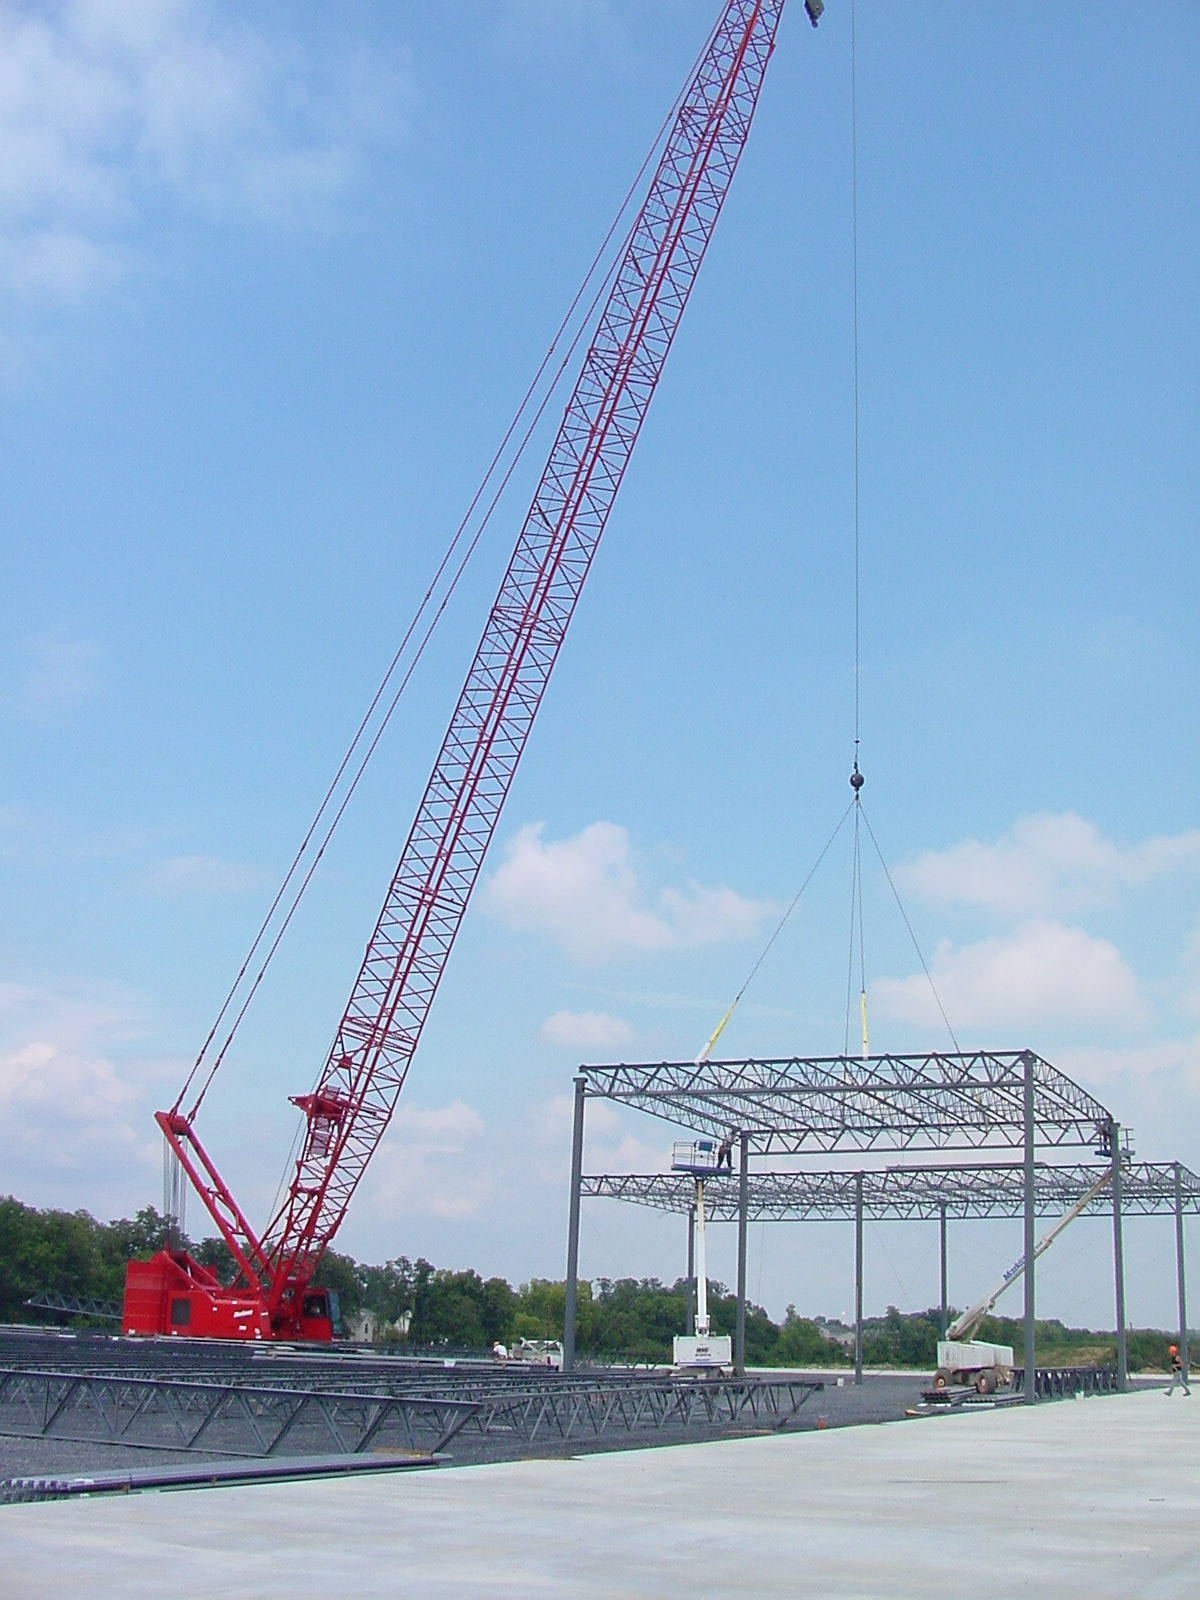 Conewago Manufacturing Steel Project - Reckitt Benckiser